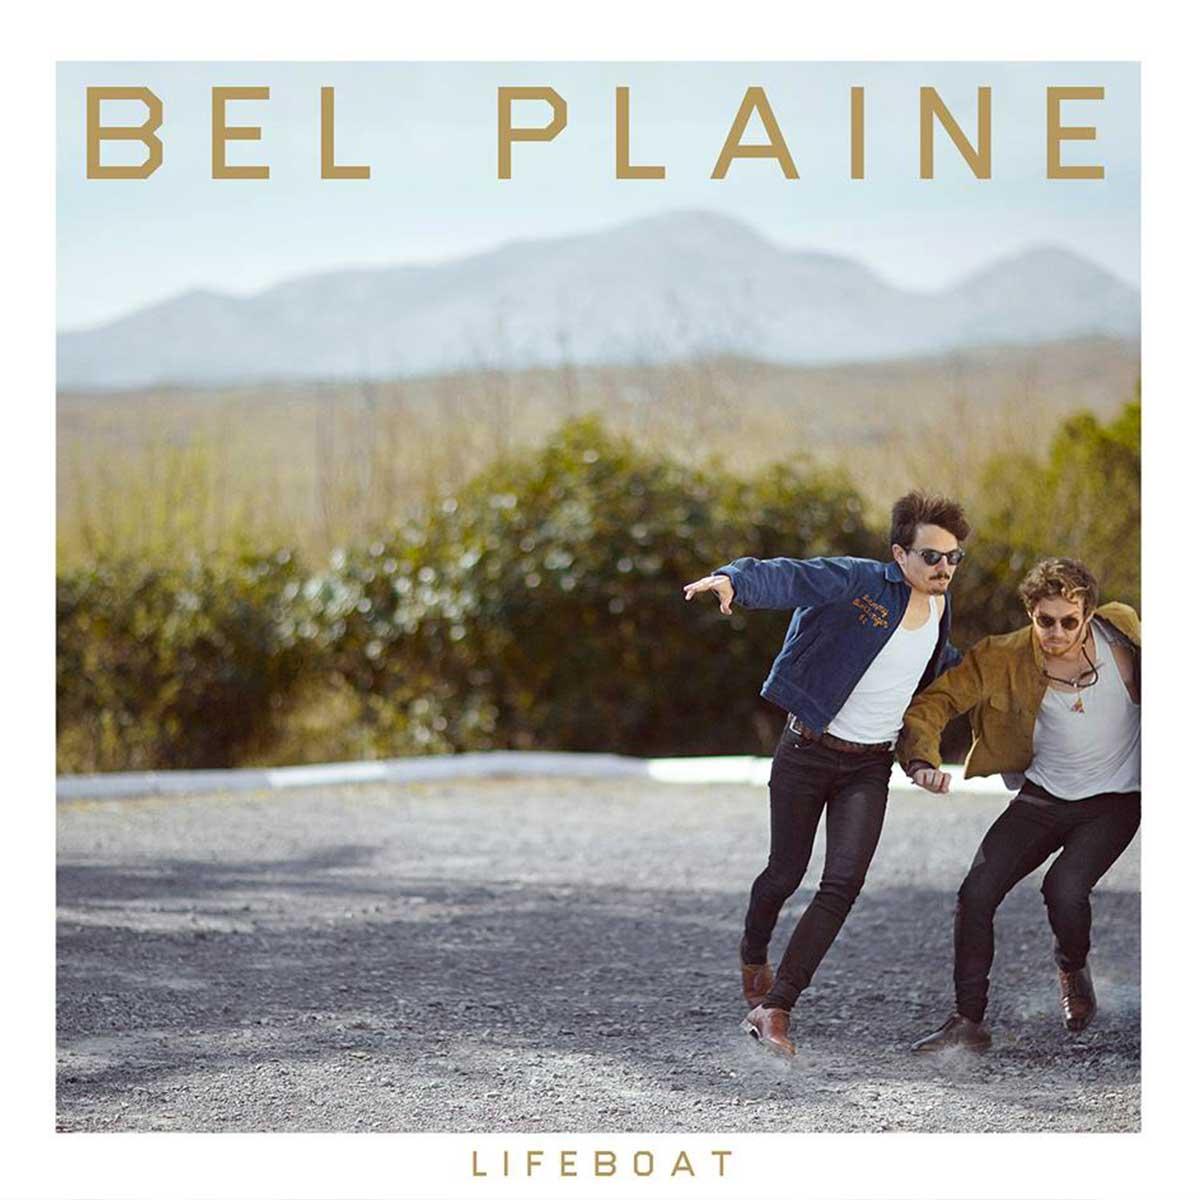 Bel Plaine interview